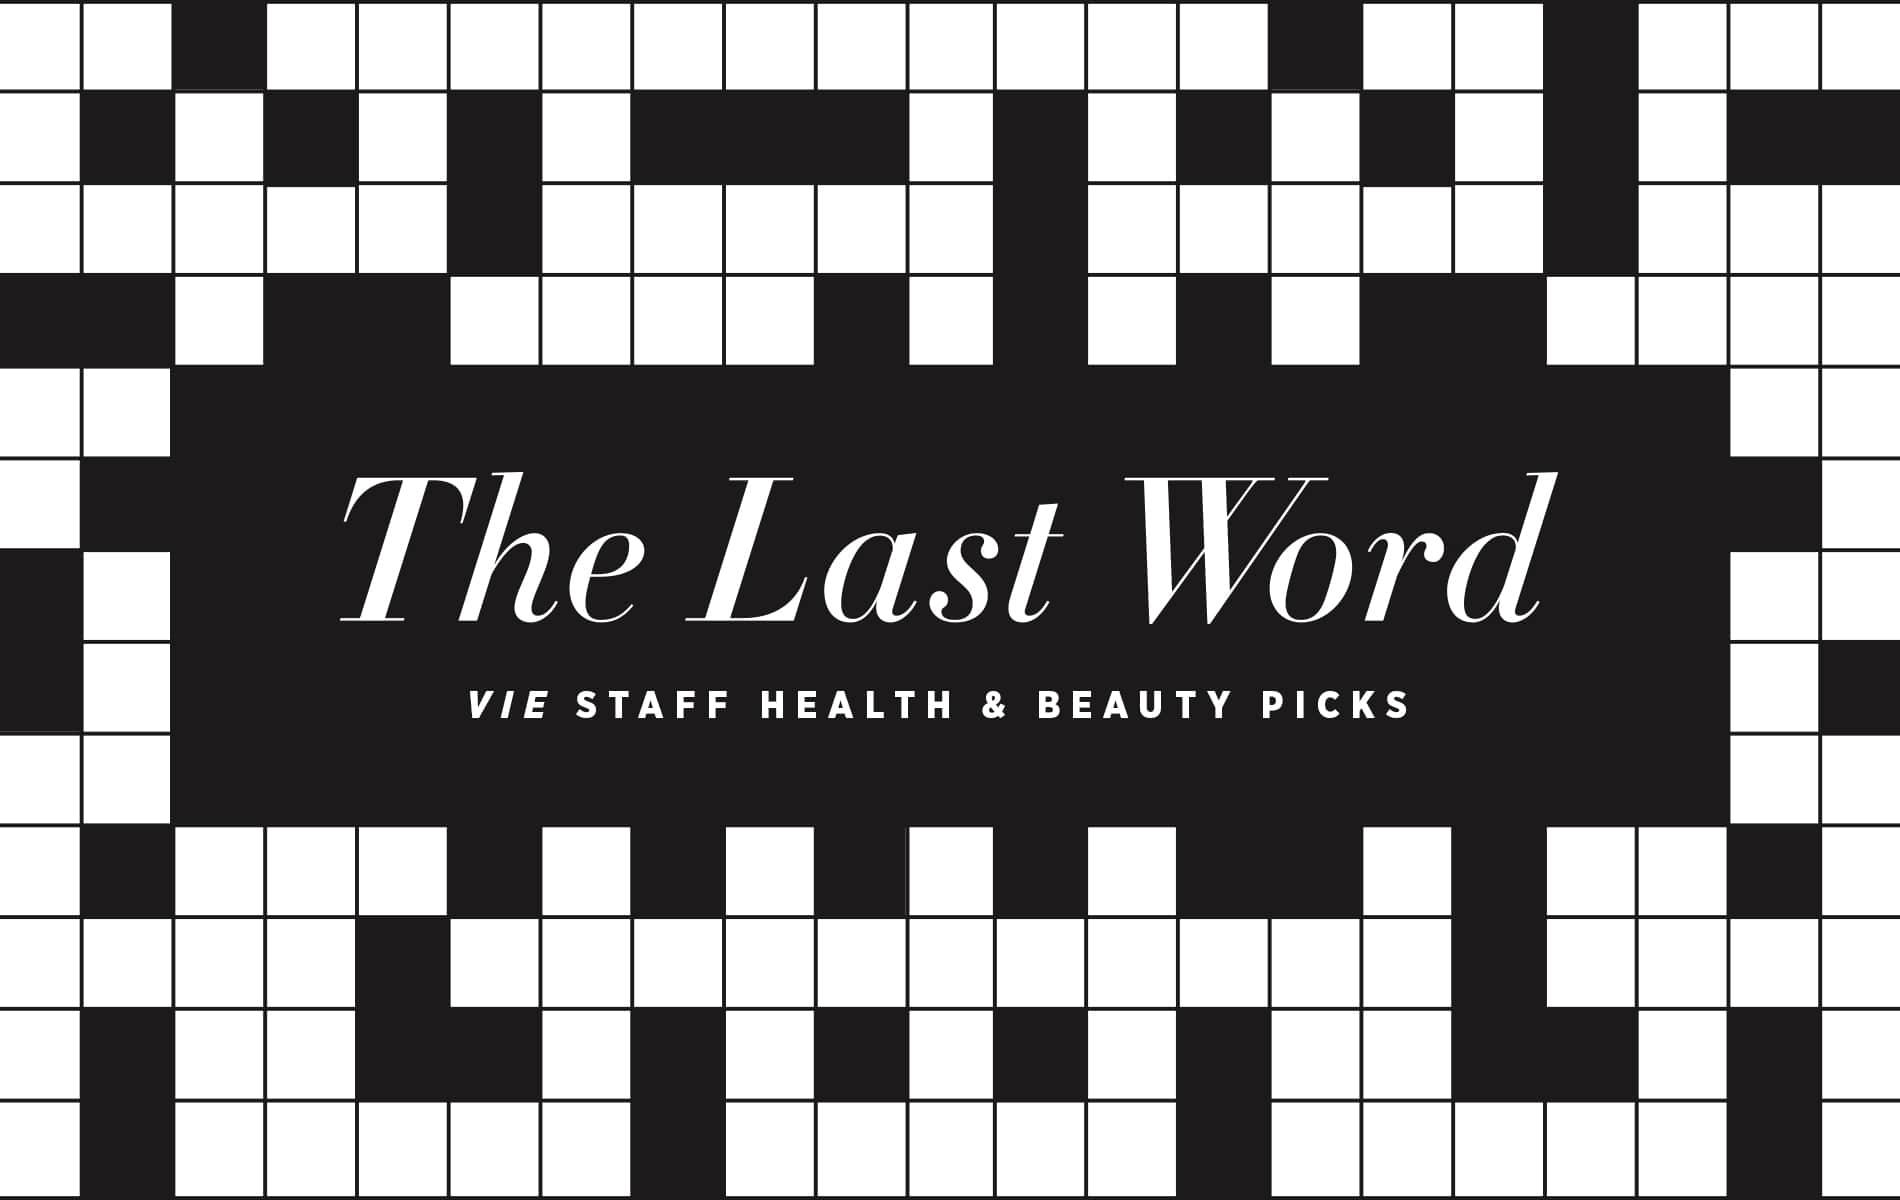 VIE Magazine April 2019 Health & Wellness Issue - Crossword Puzzle